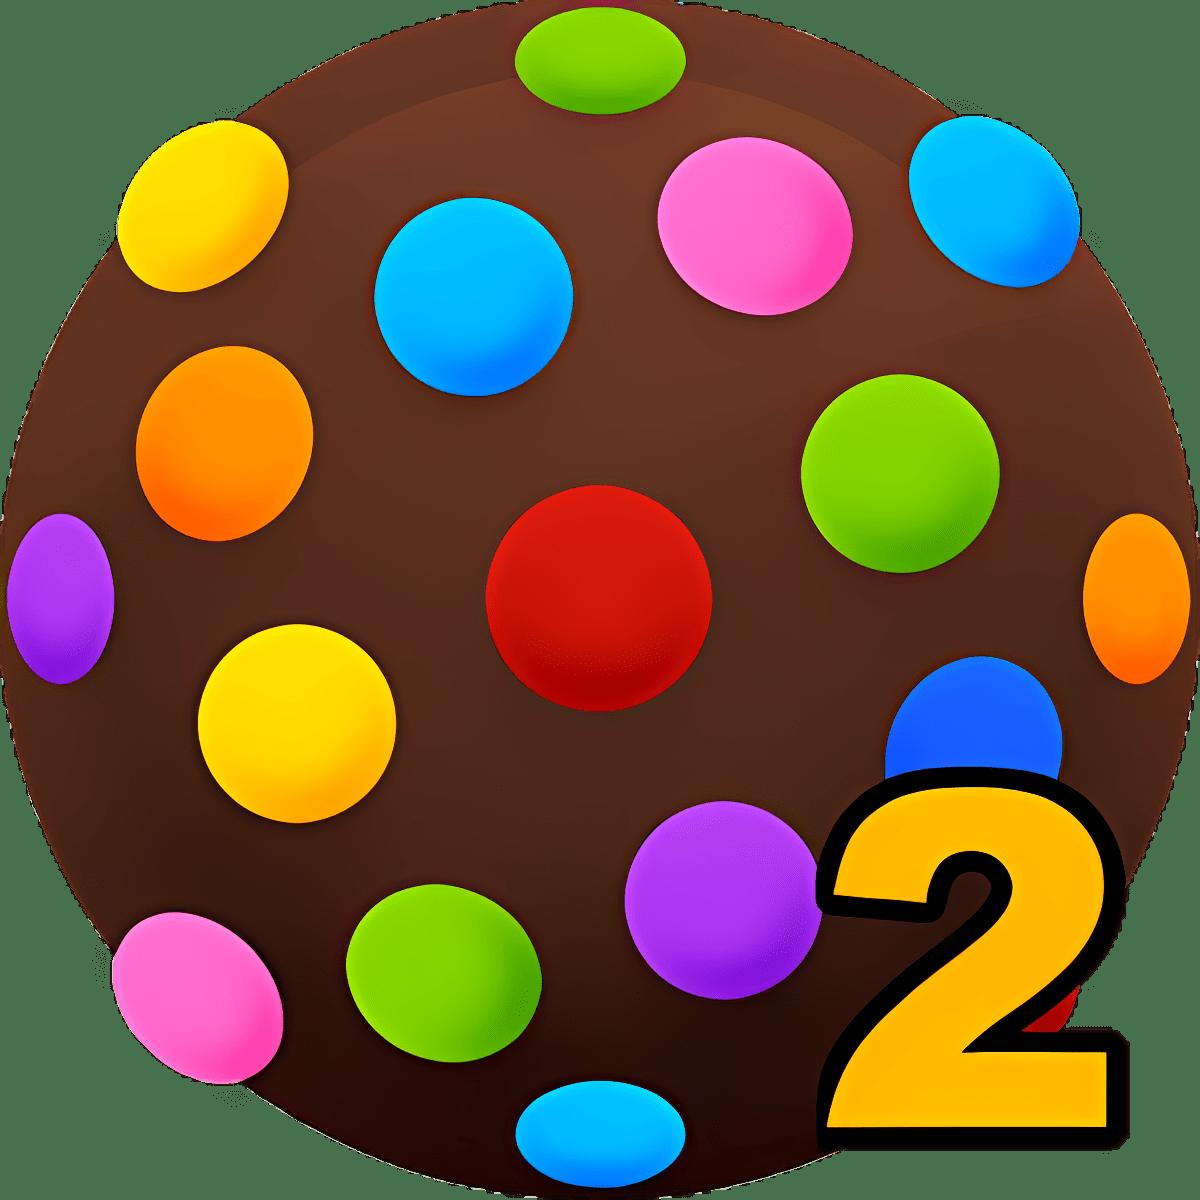 Joyas dulces manía Saga 2